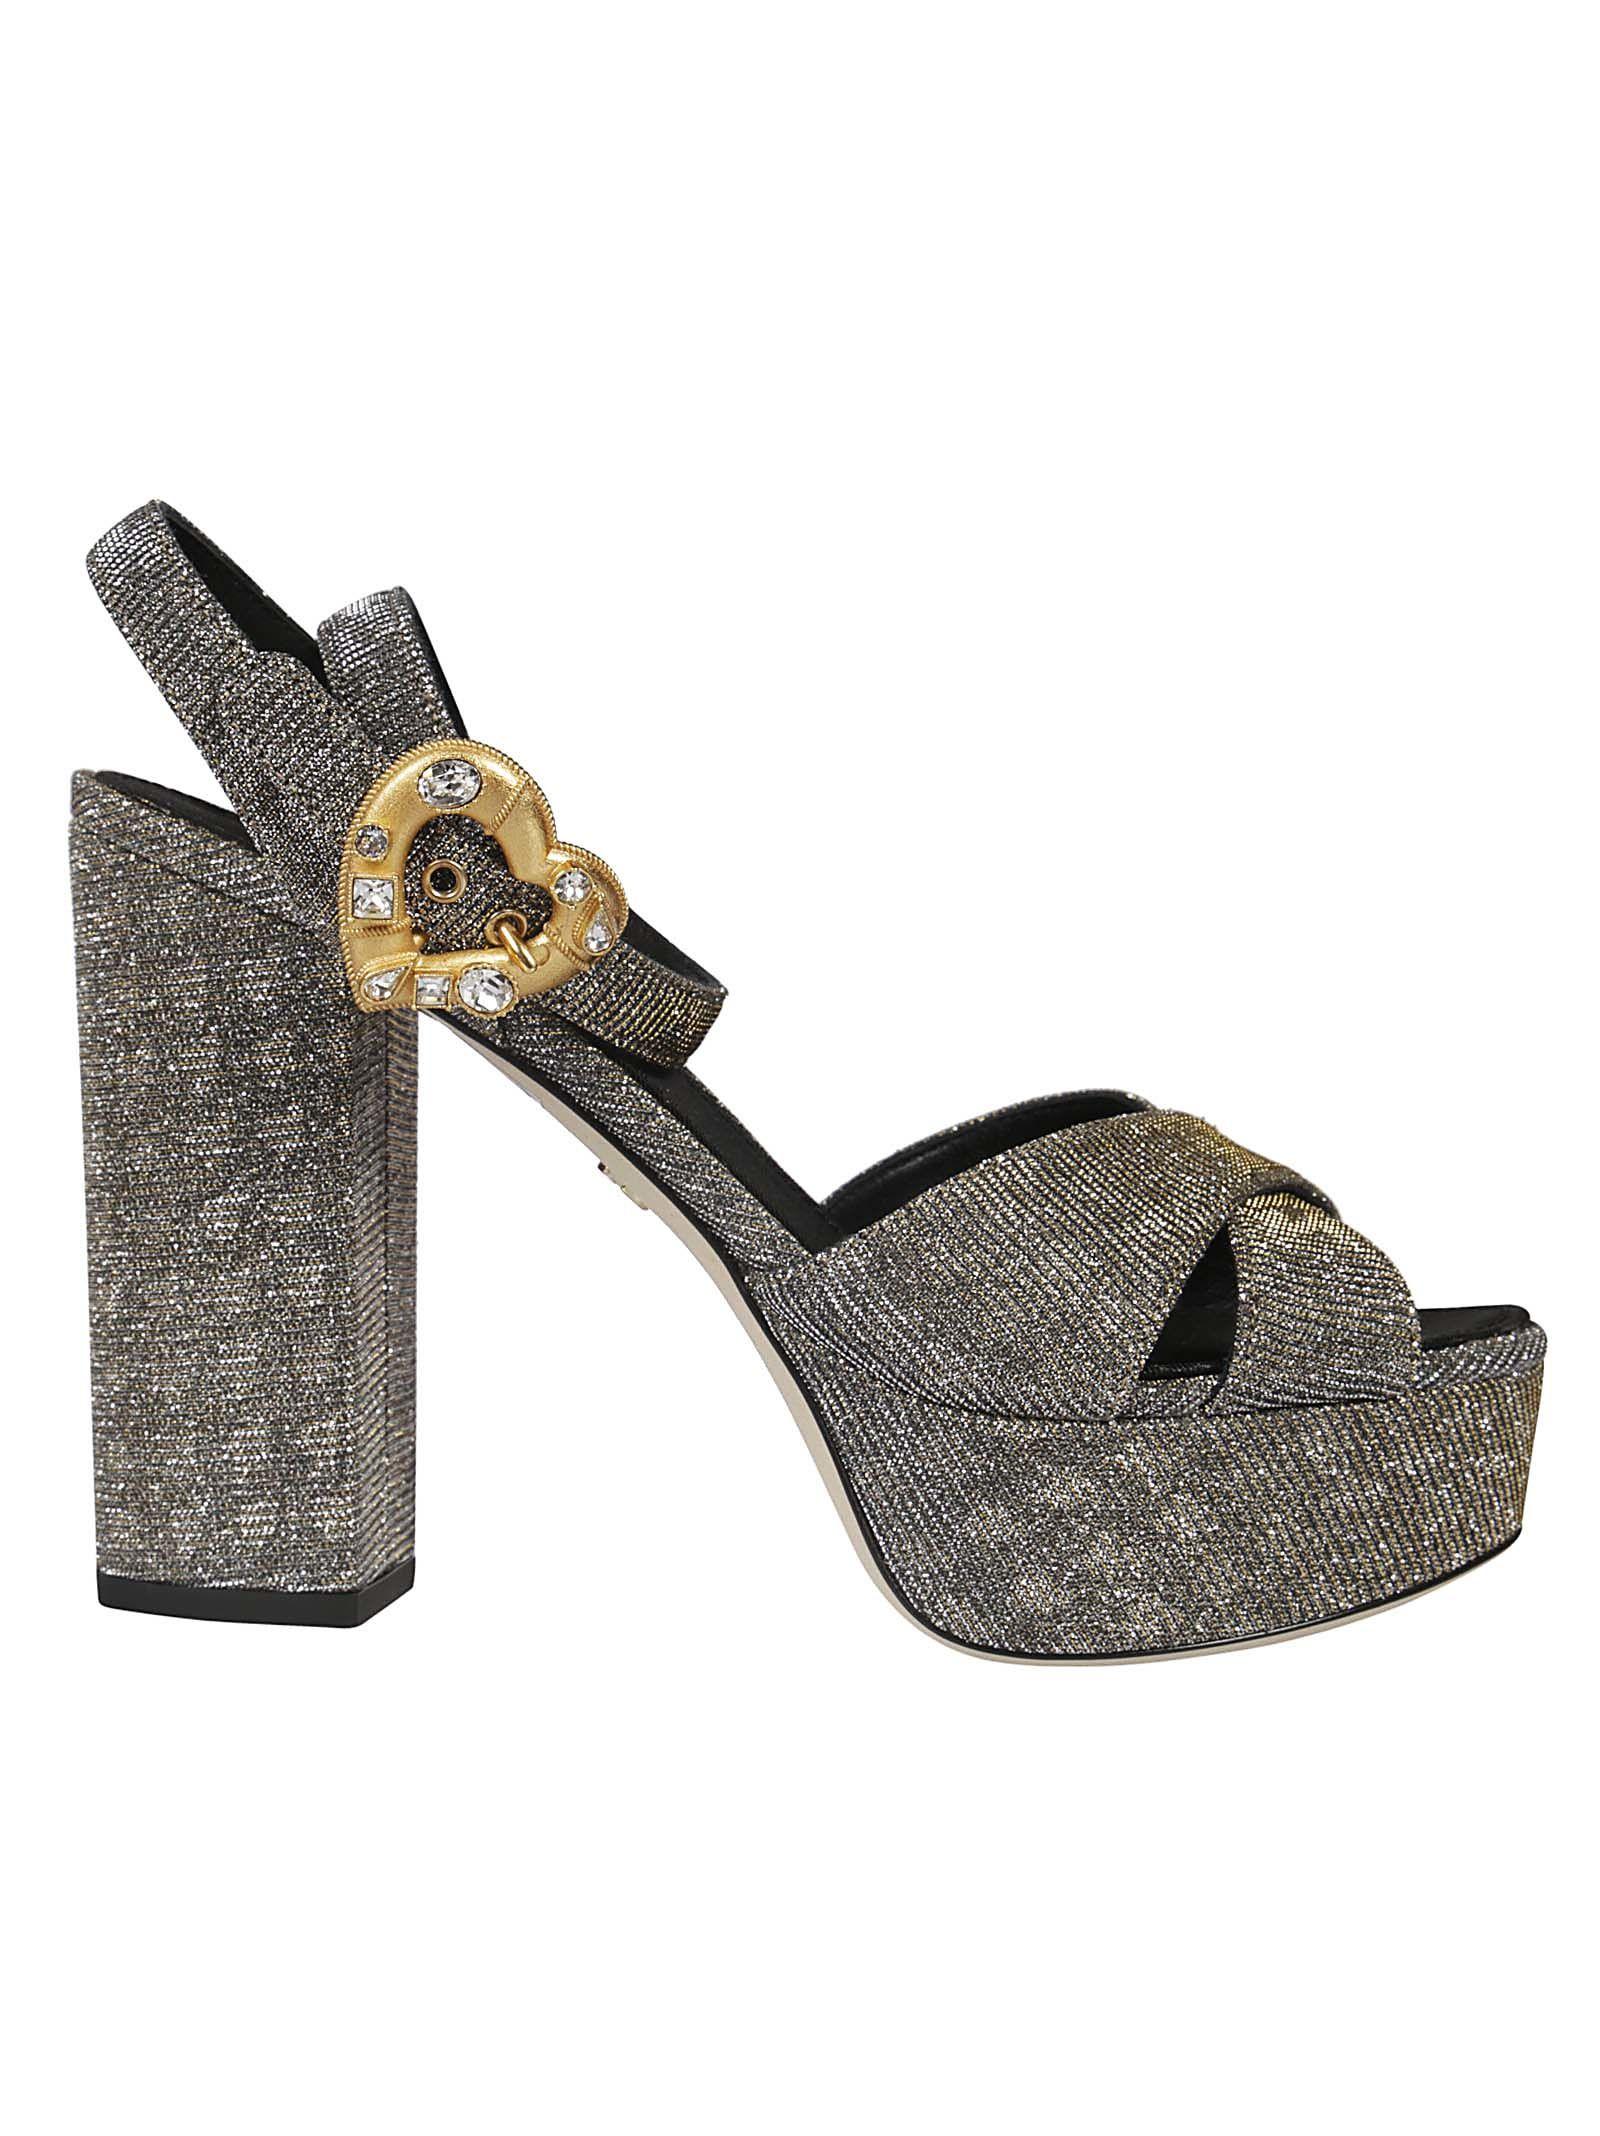 842e85acc7292 Dolce   Gabbana Heart Buckle Platform Sandals In 8Toro-Arge-Nero ...